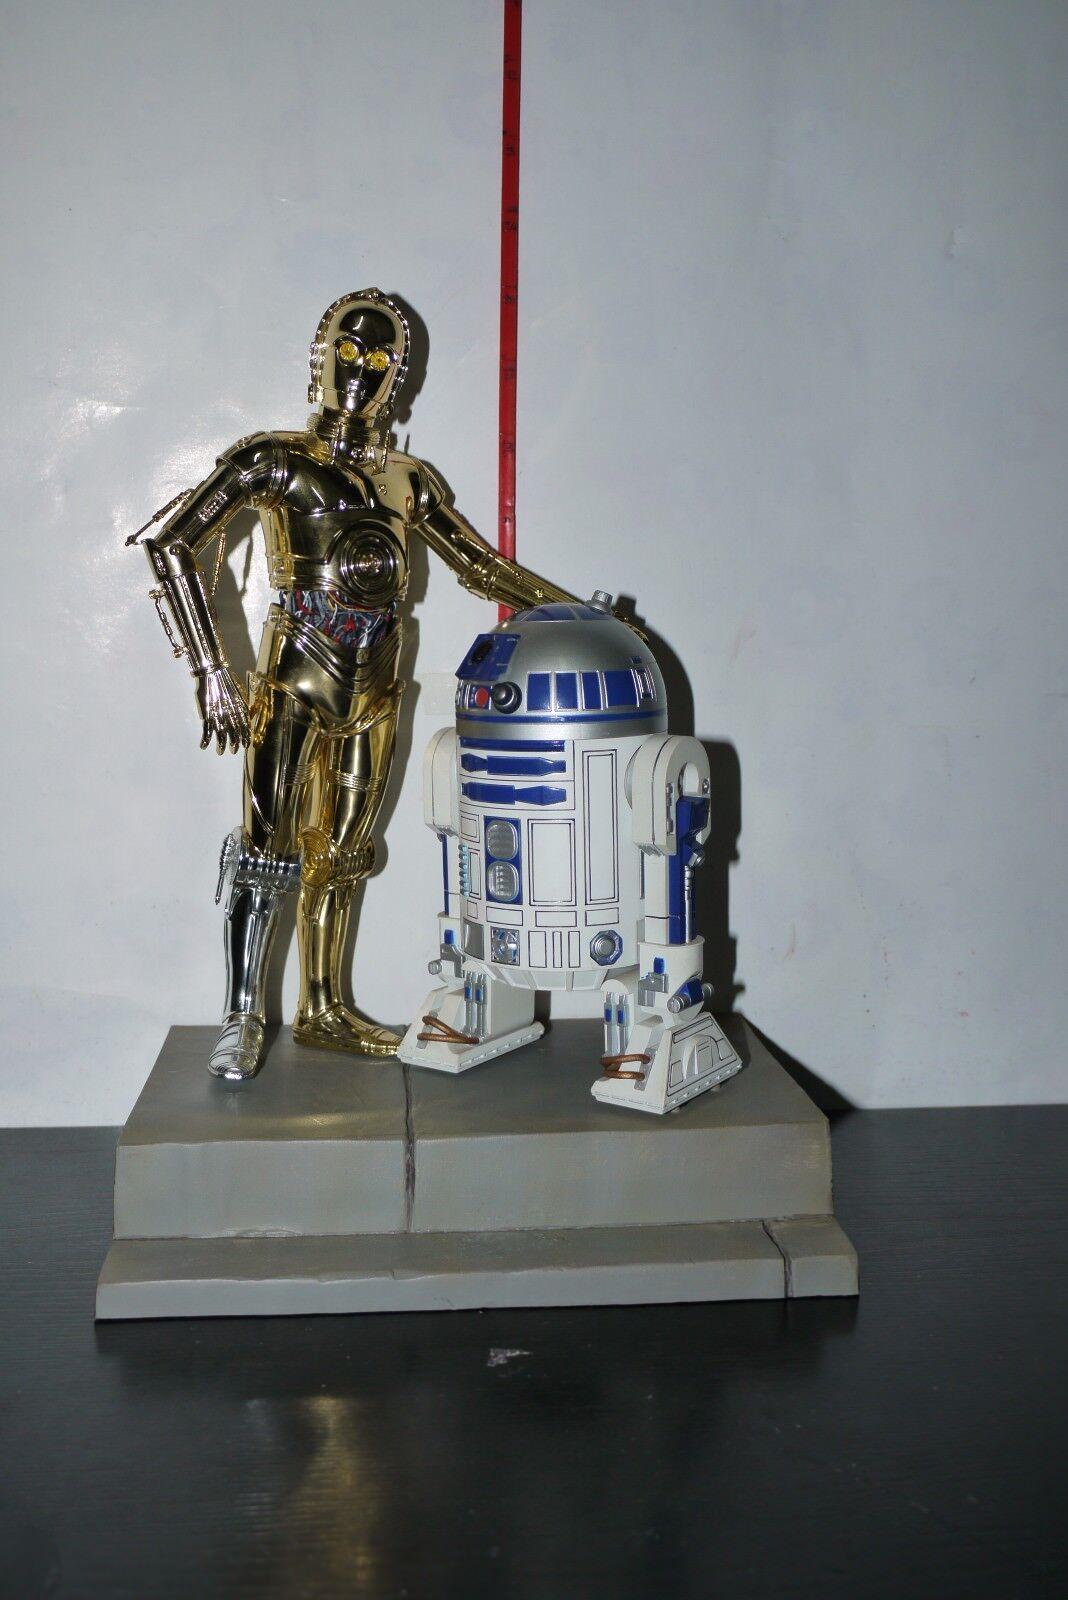 KOTOBUKIYA KOTOBUKIYA KOTOBUKIYA STAR WARS C-3PO & R2-D2 EP4 ver ARTFX 1/7 SCALE VINYL STATUE + BOX 99dd40